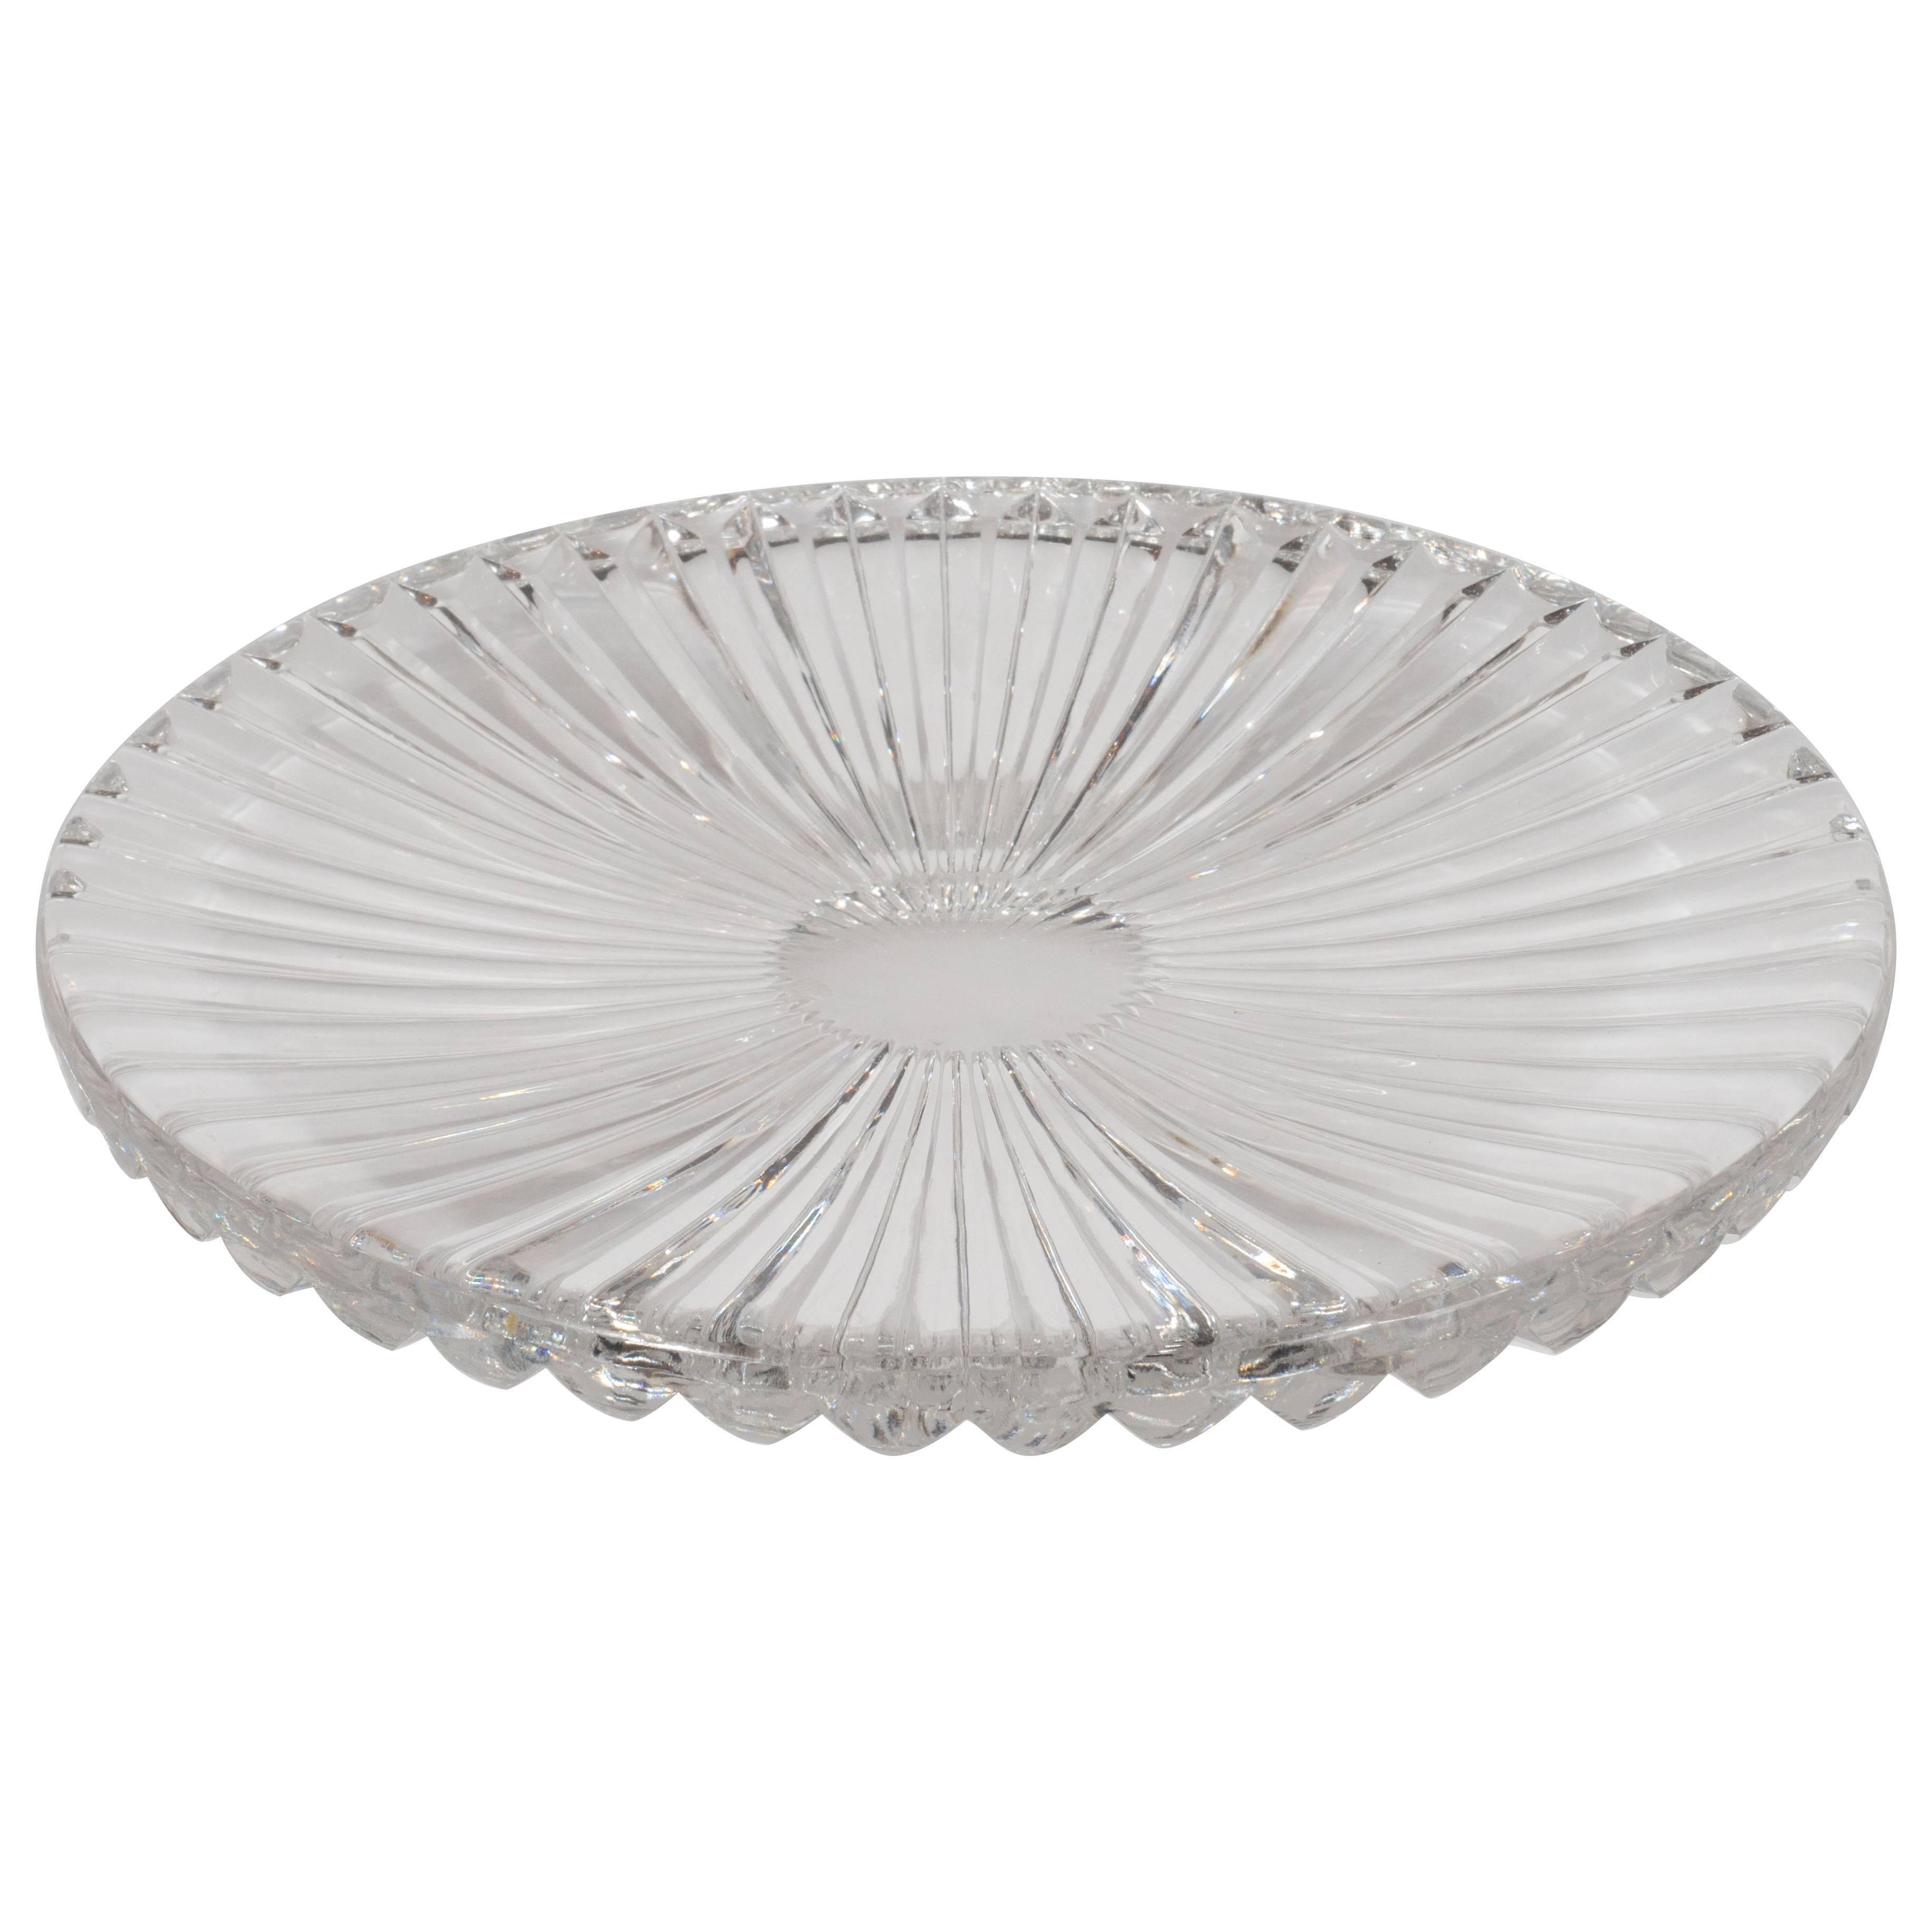 Sophisticated Mid-Century Modern Sunburst Etched Crystal Serving Plate